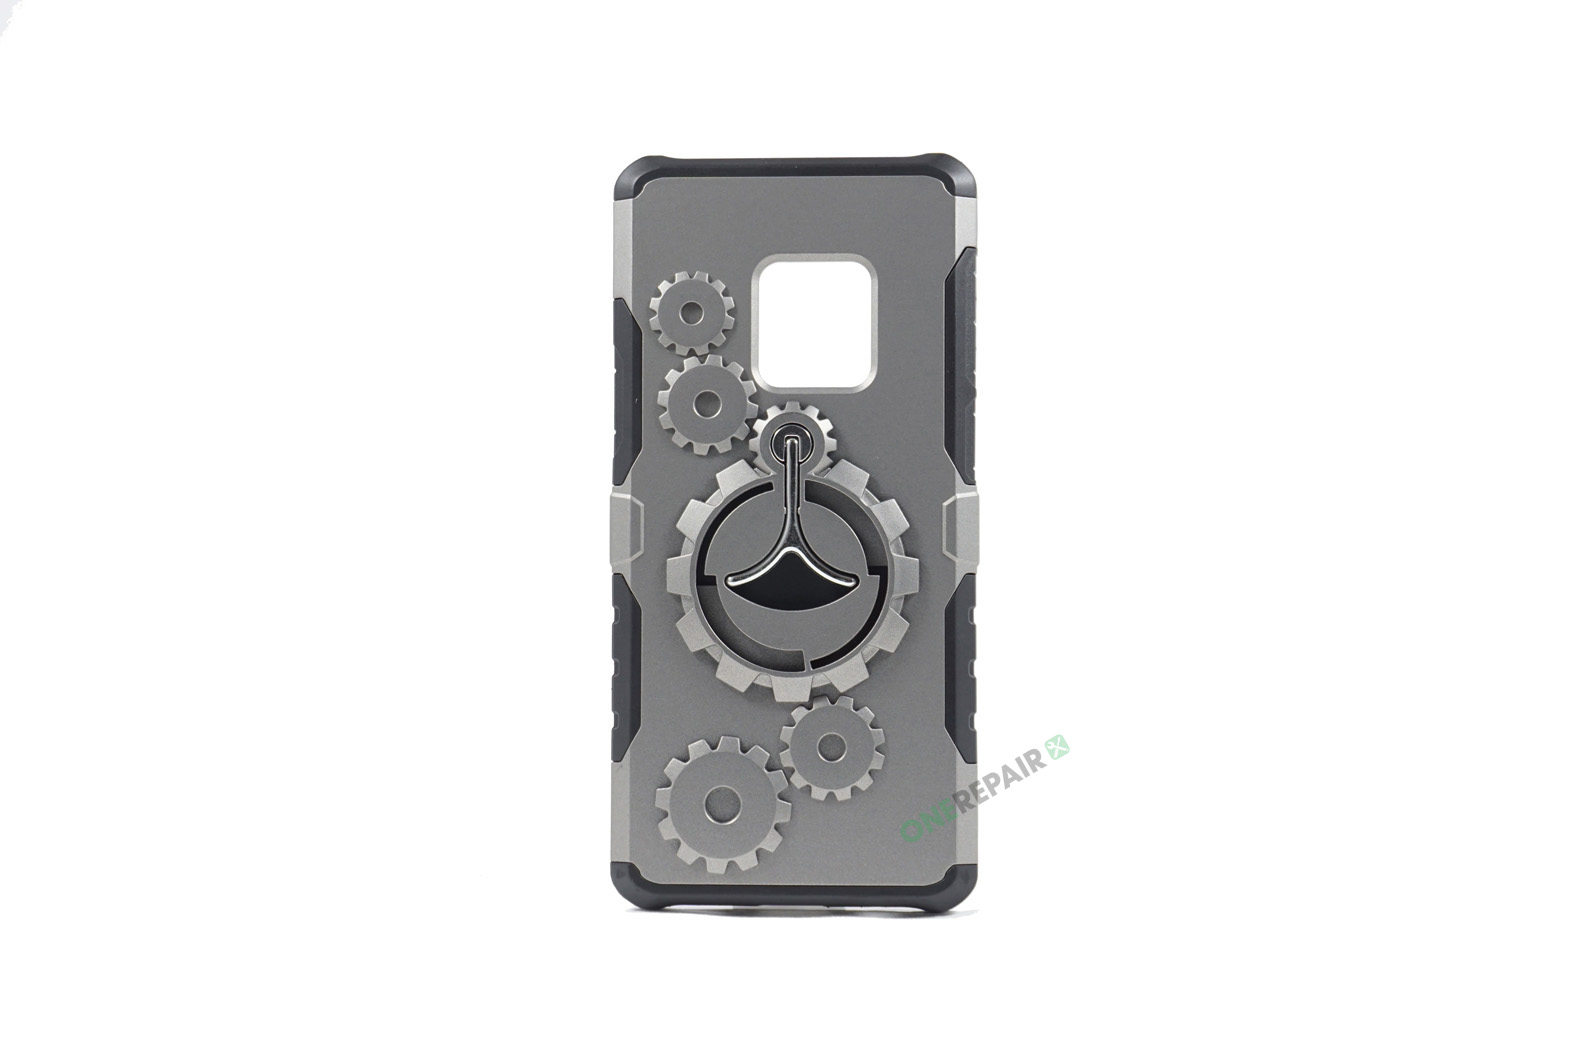 351903_Samsung_S9_Gear_Hard_Case_Hardcase_Haandvaerkercover_Haandvaerker_Cover_Greb_Graa_OneRepair_00001